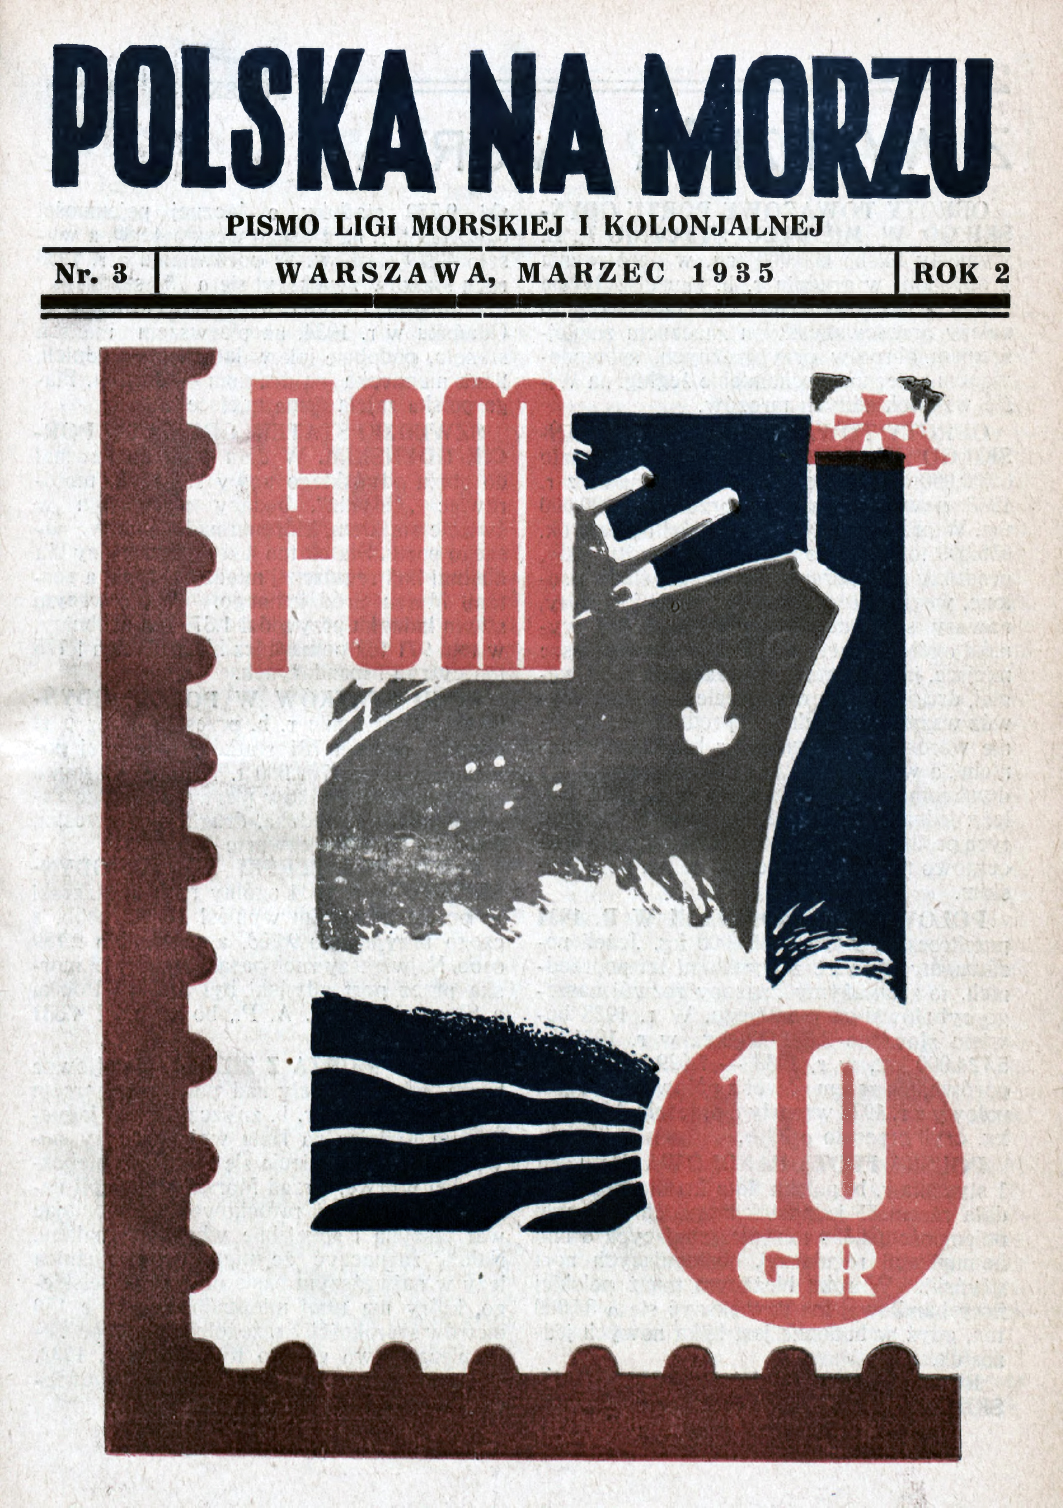 Polska na Morzu : pismo Ligi Morskiej i Kolonjalnej. - Liga Morska i Kolonialna, 1935, nr 3